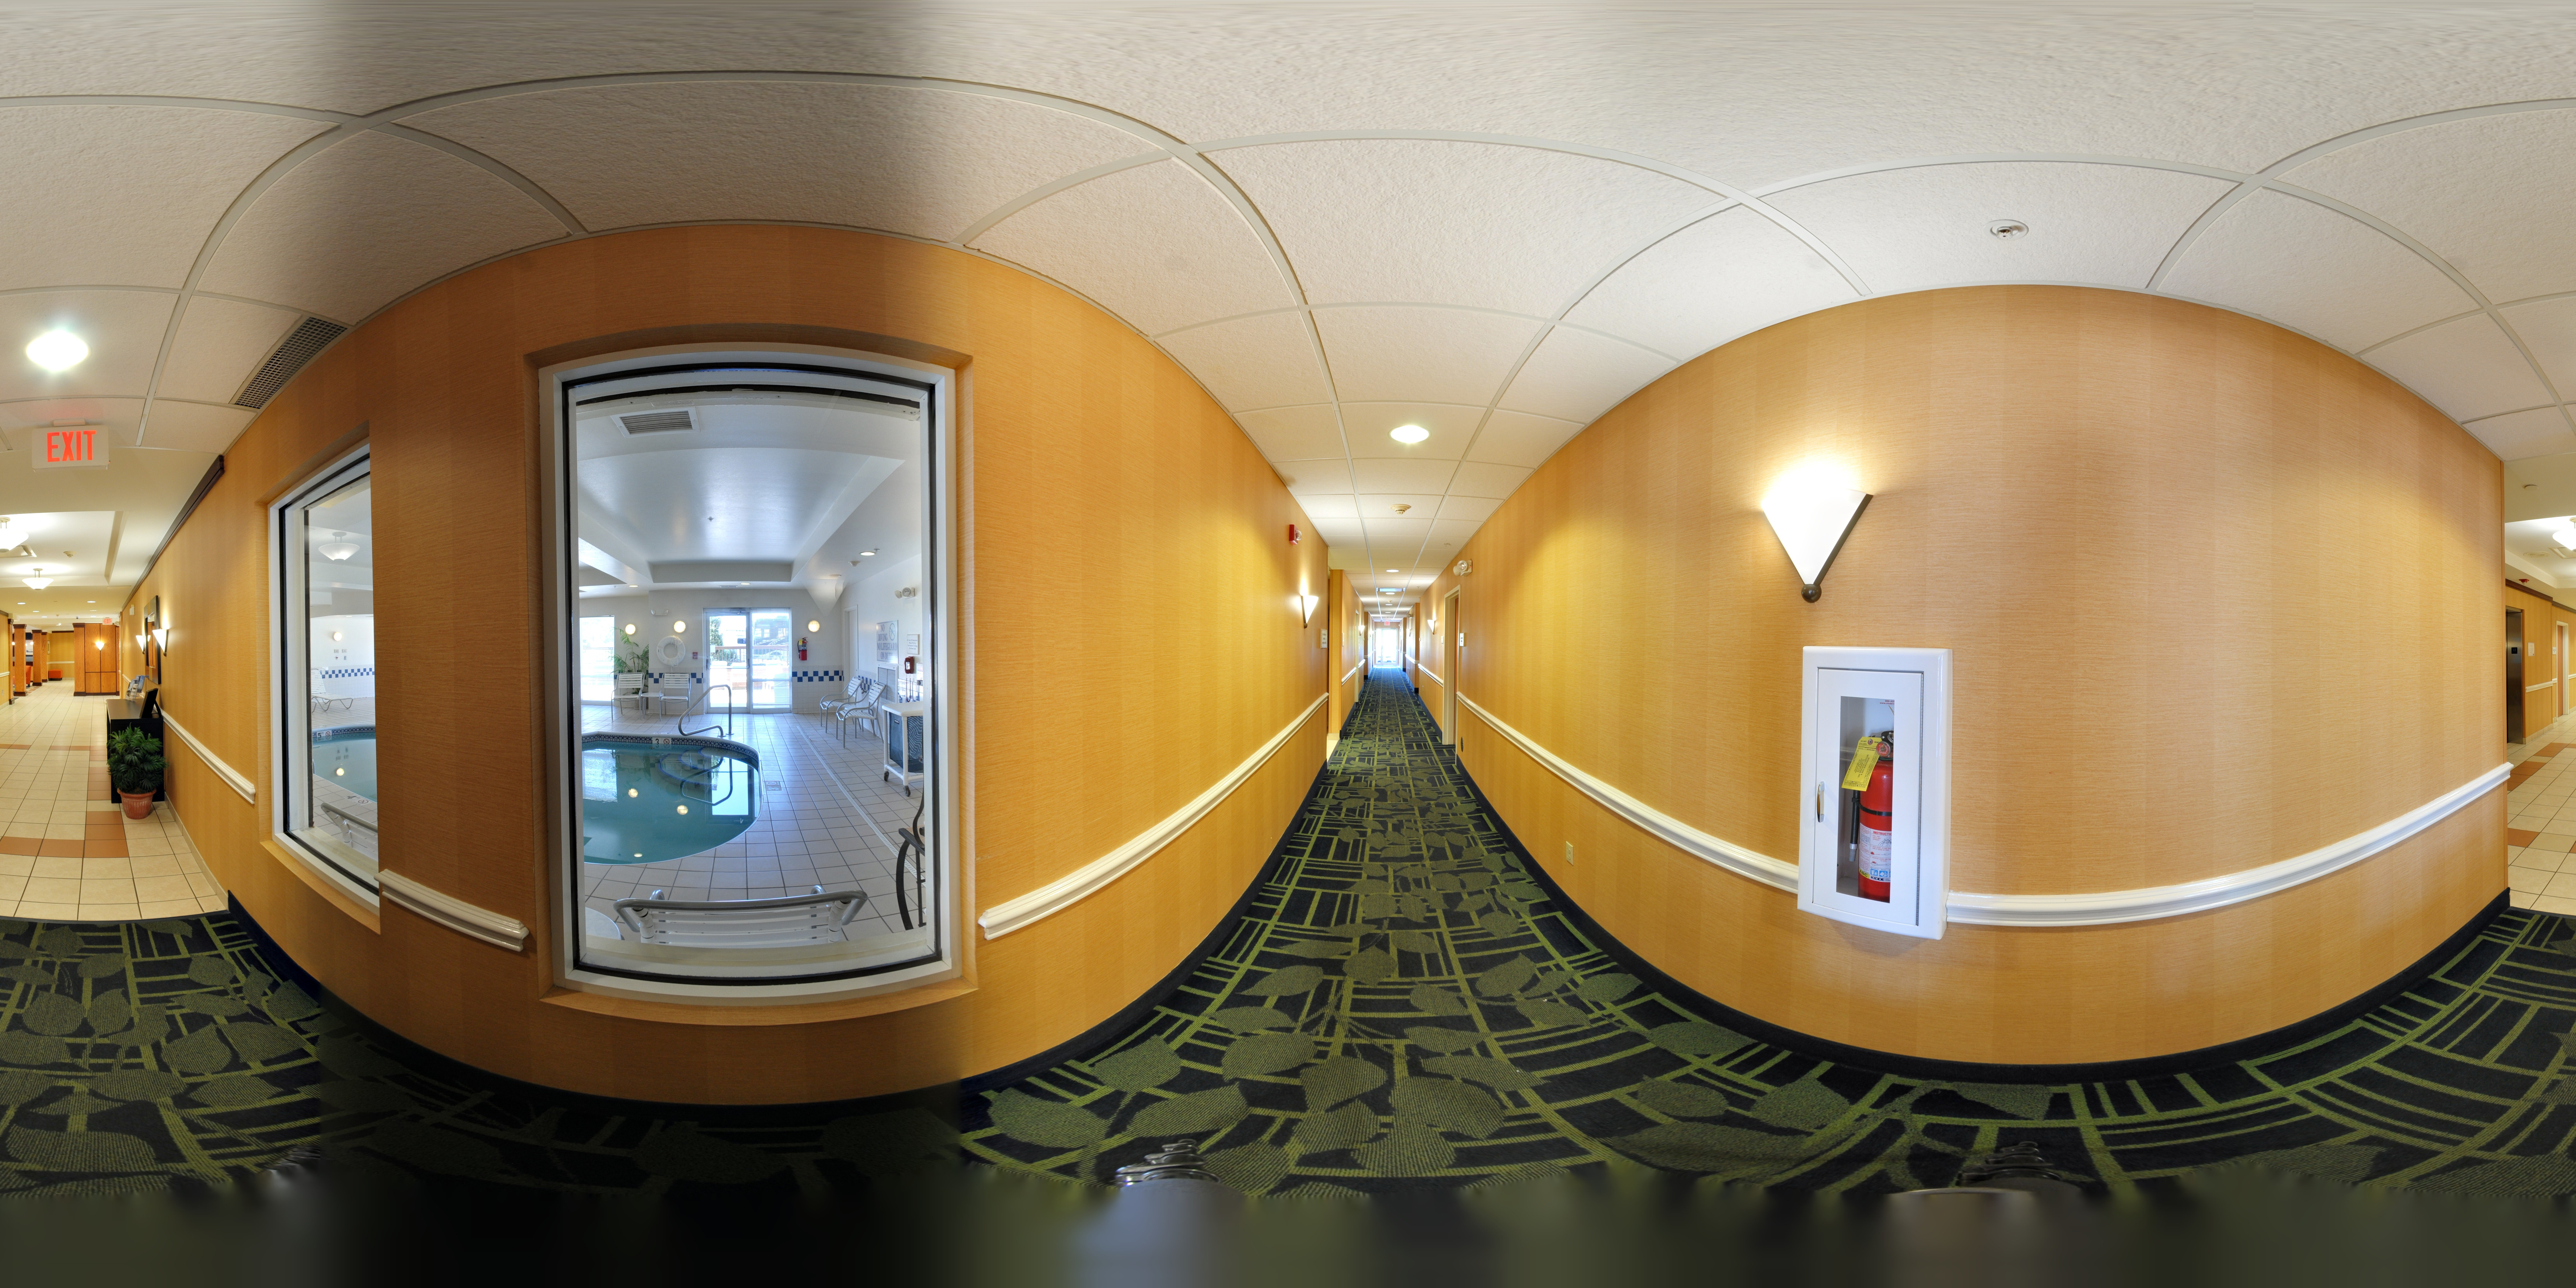 Fairfield Inn & Suites by Marriott Akron South image 40